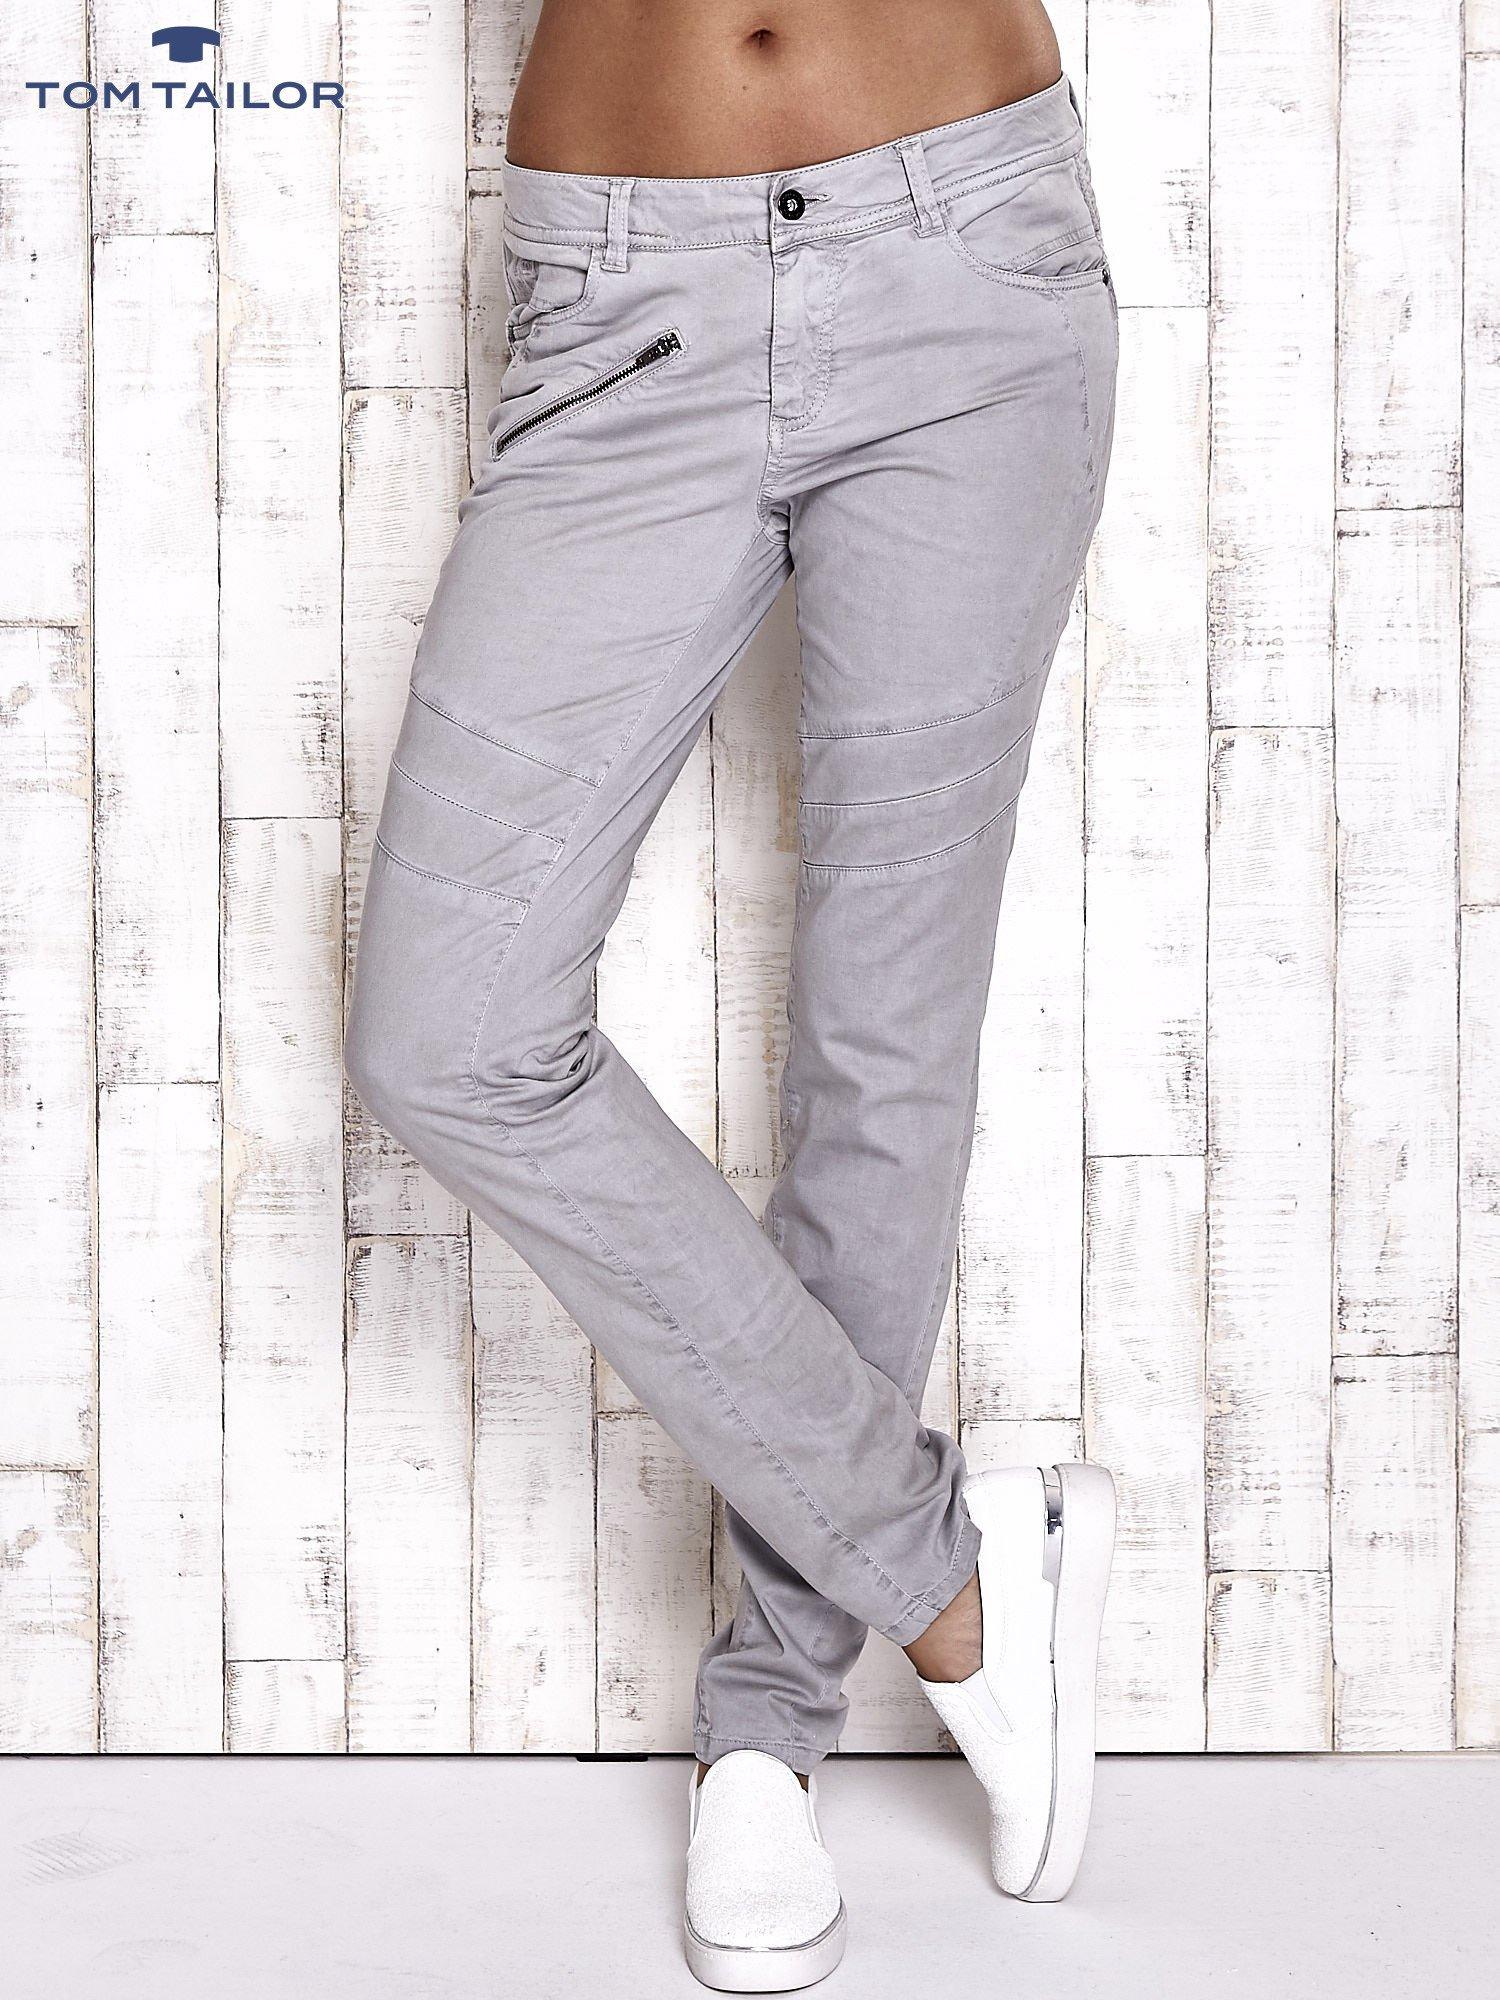 TOM TAILOR Szare materiałowe spodnie                                  zdj.                                  1